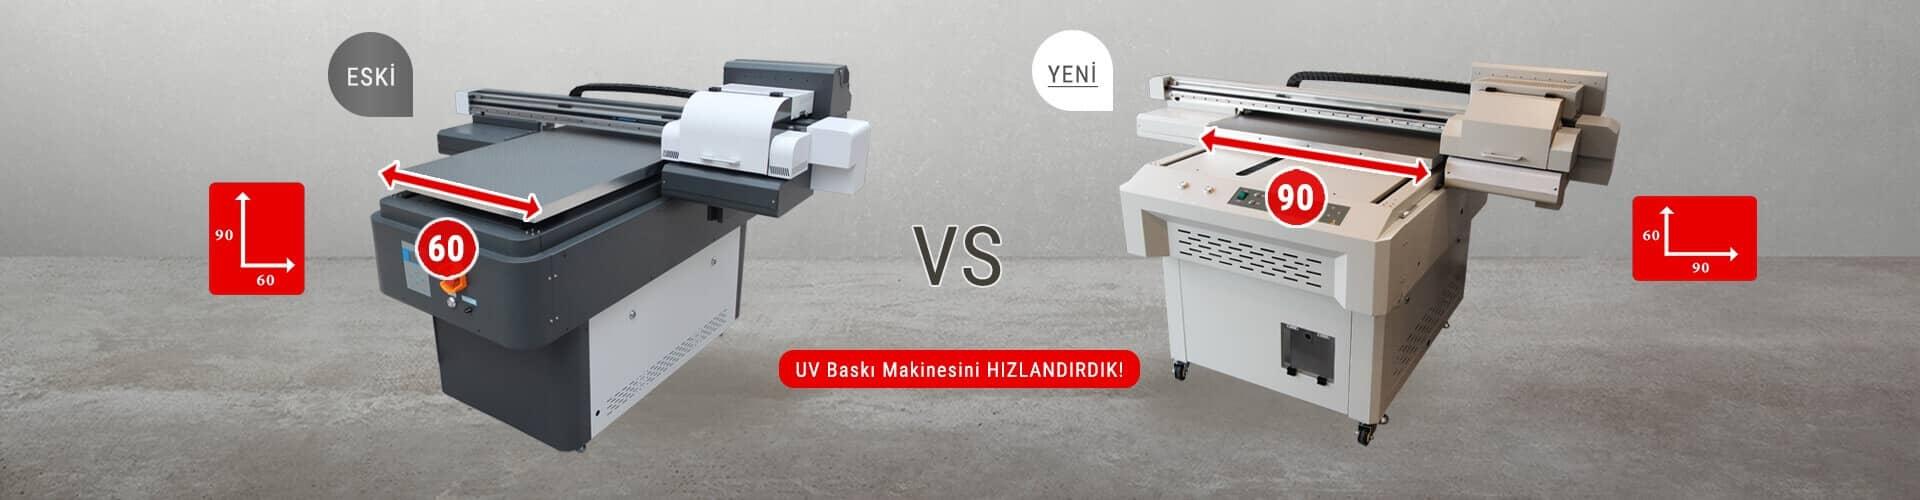 UV Baskı Makinesi